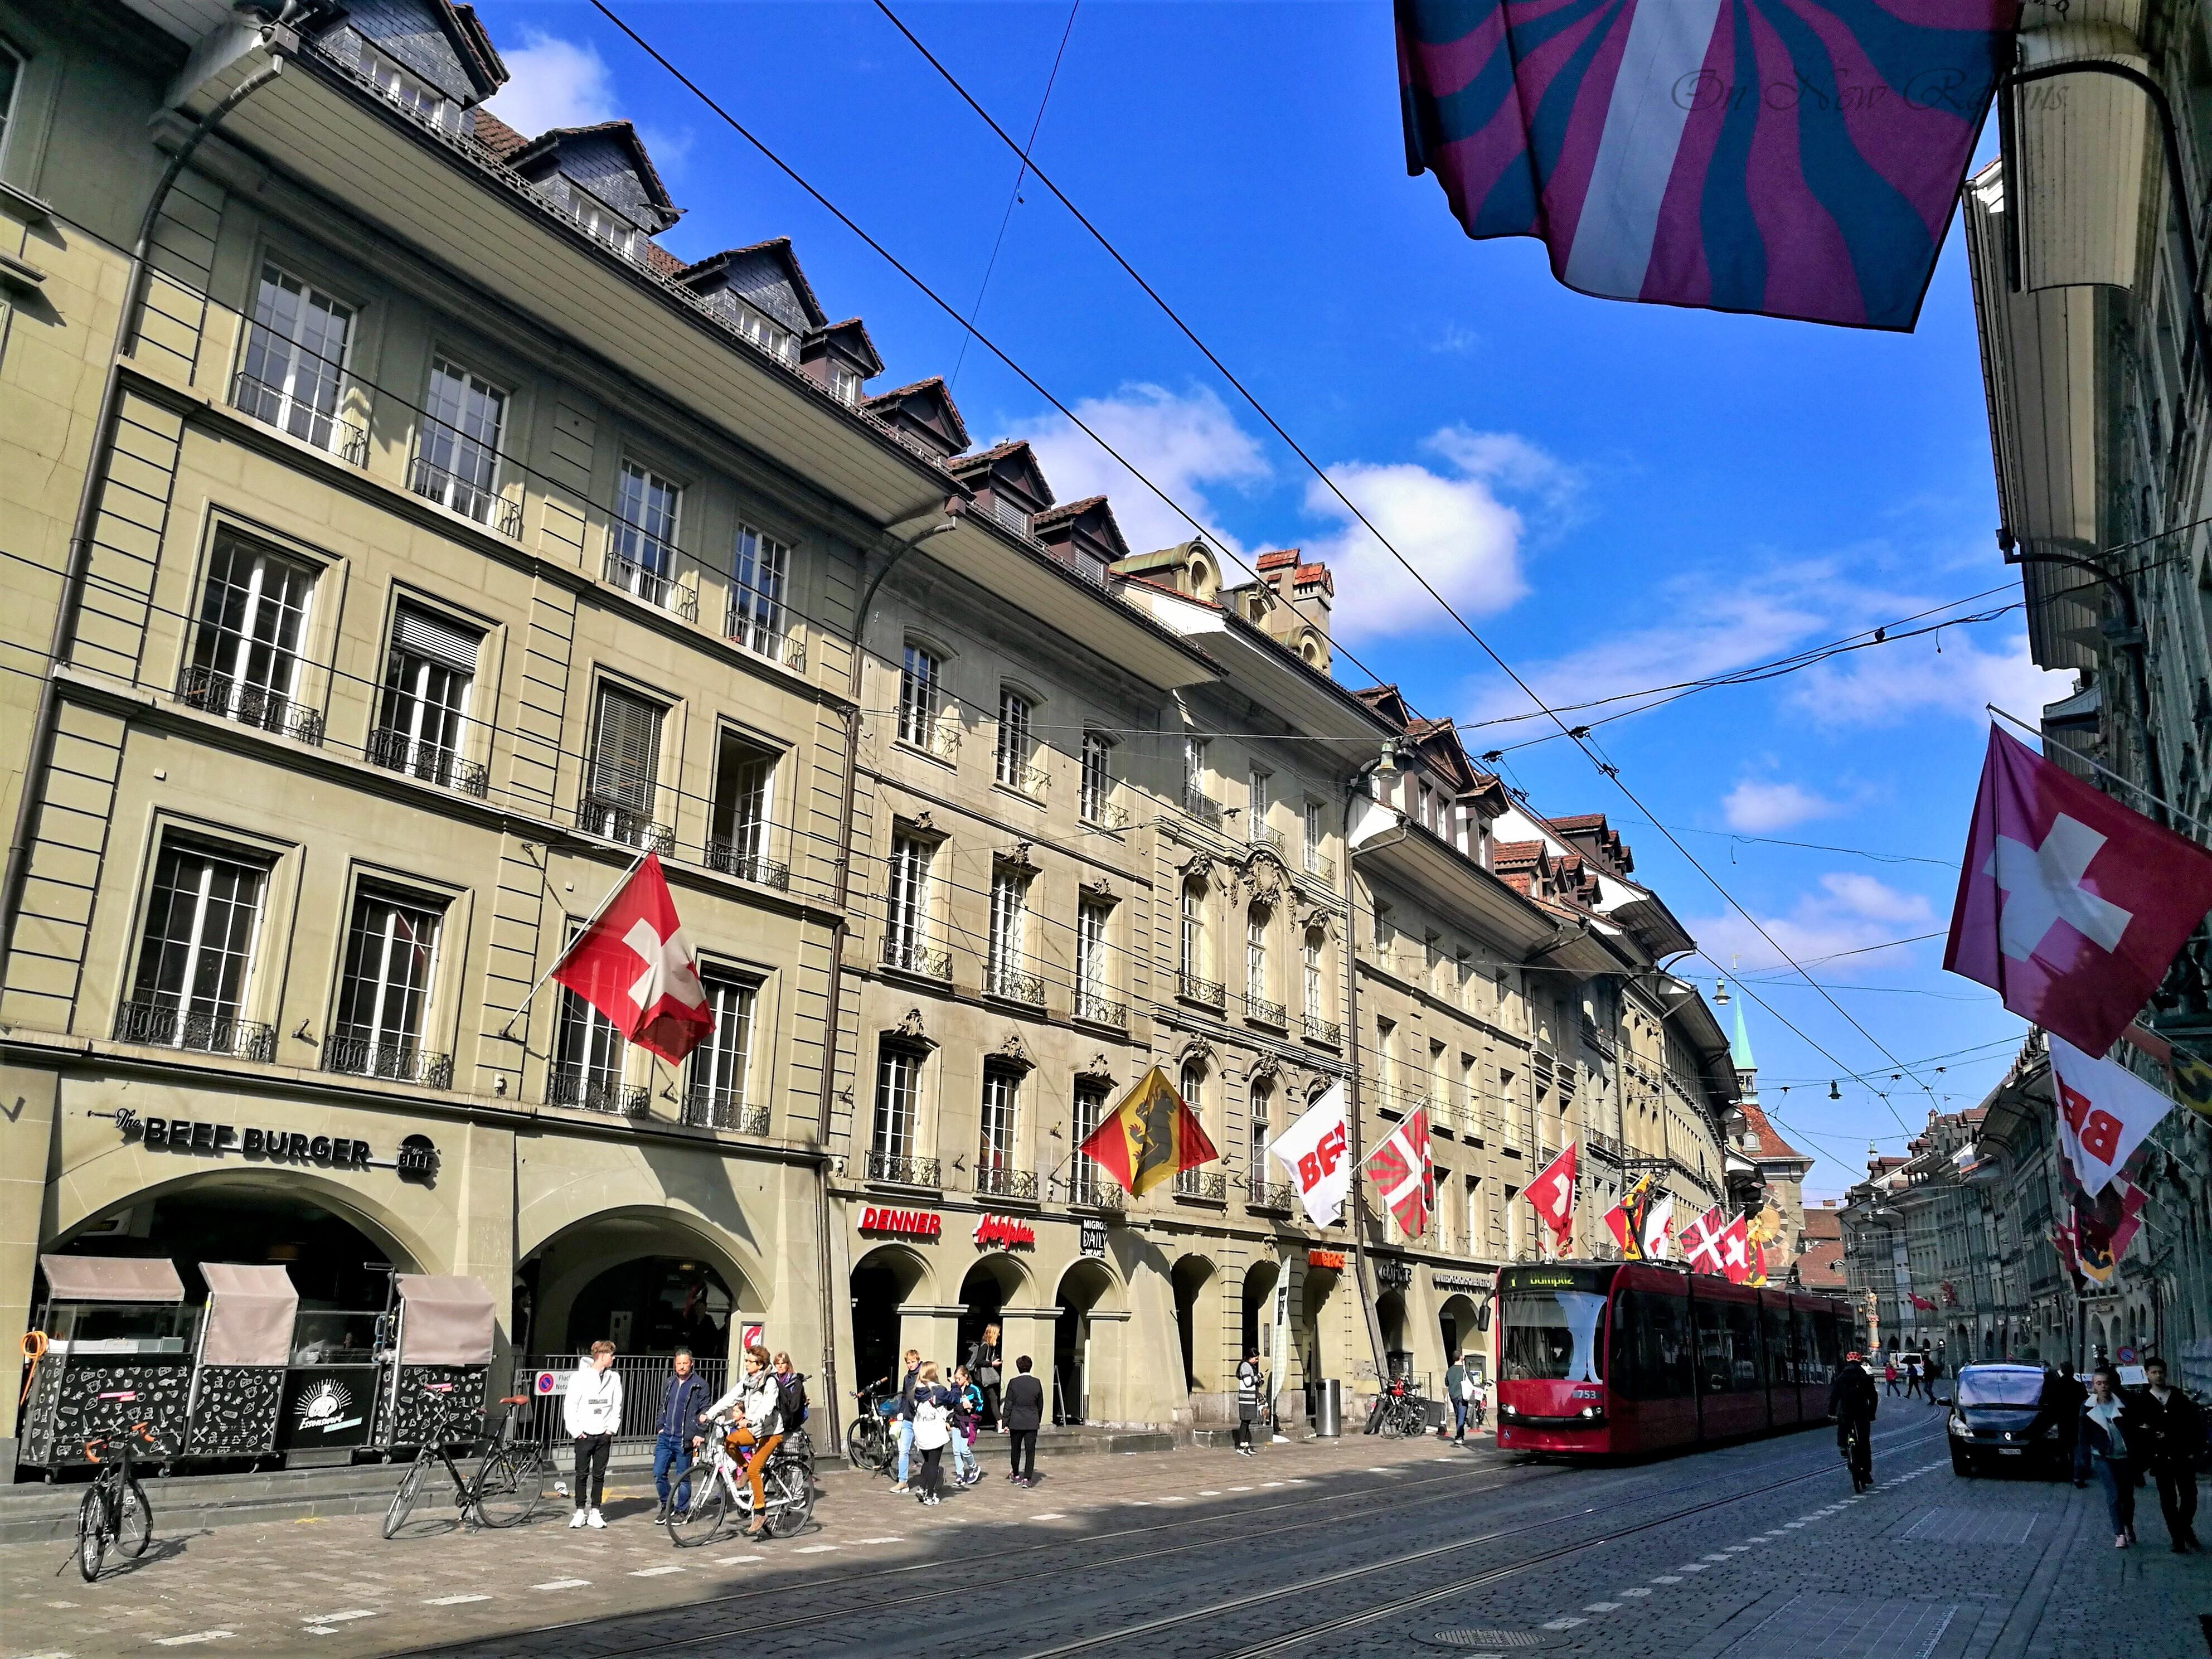 Bundesplatz-Bern-Switzerland